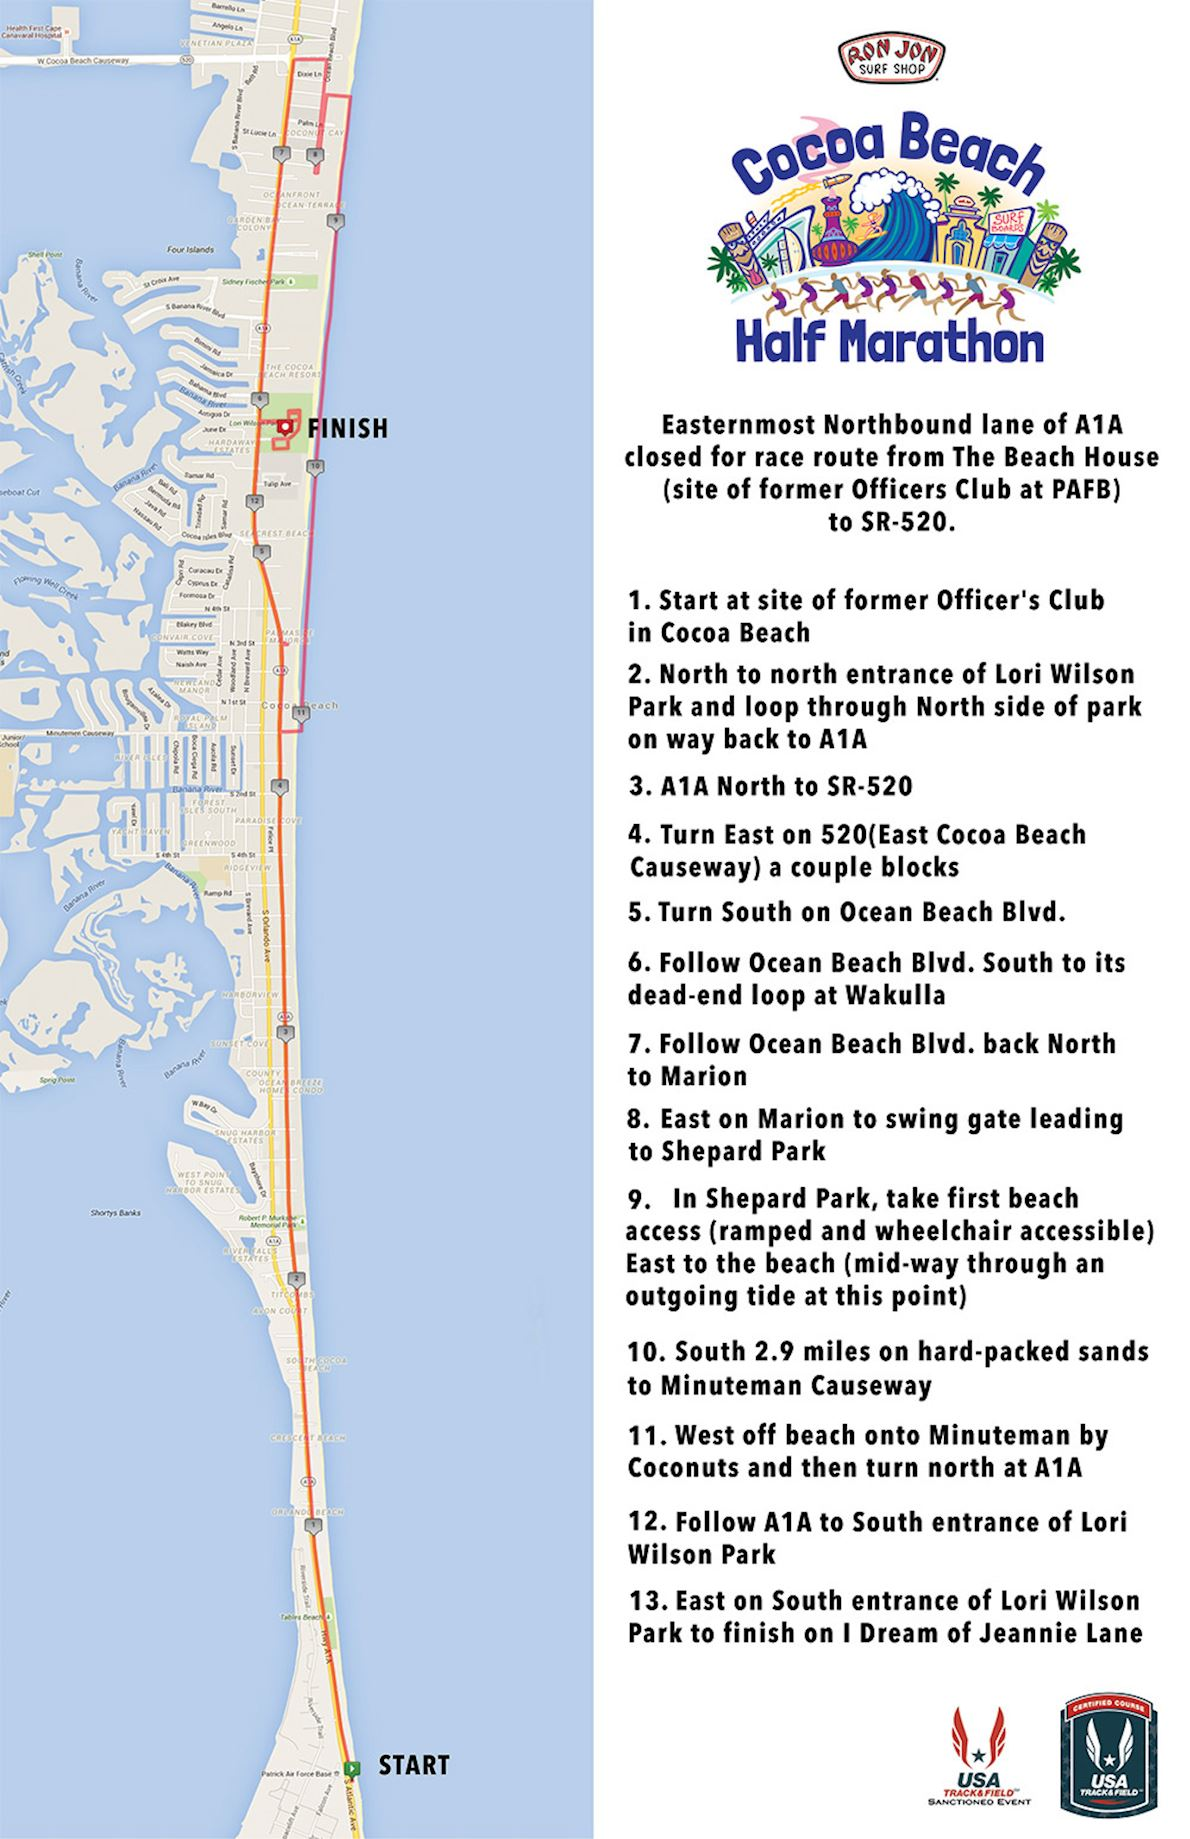 Cocoa Beach Half Marathon MAPA DEL RECORRIDO DE